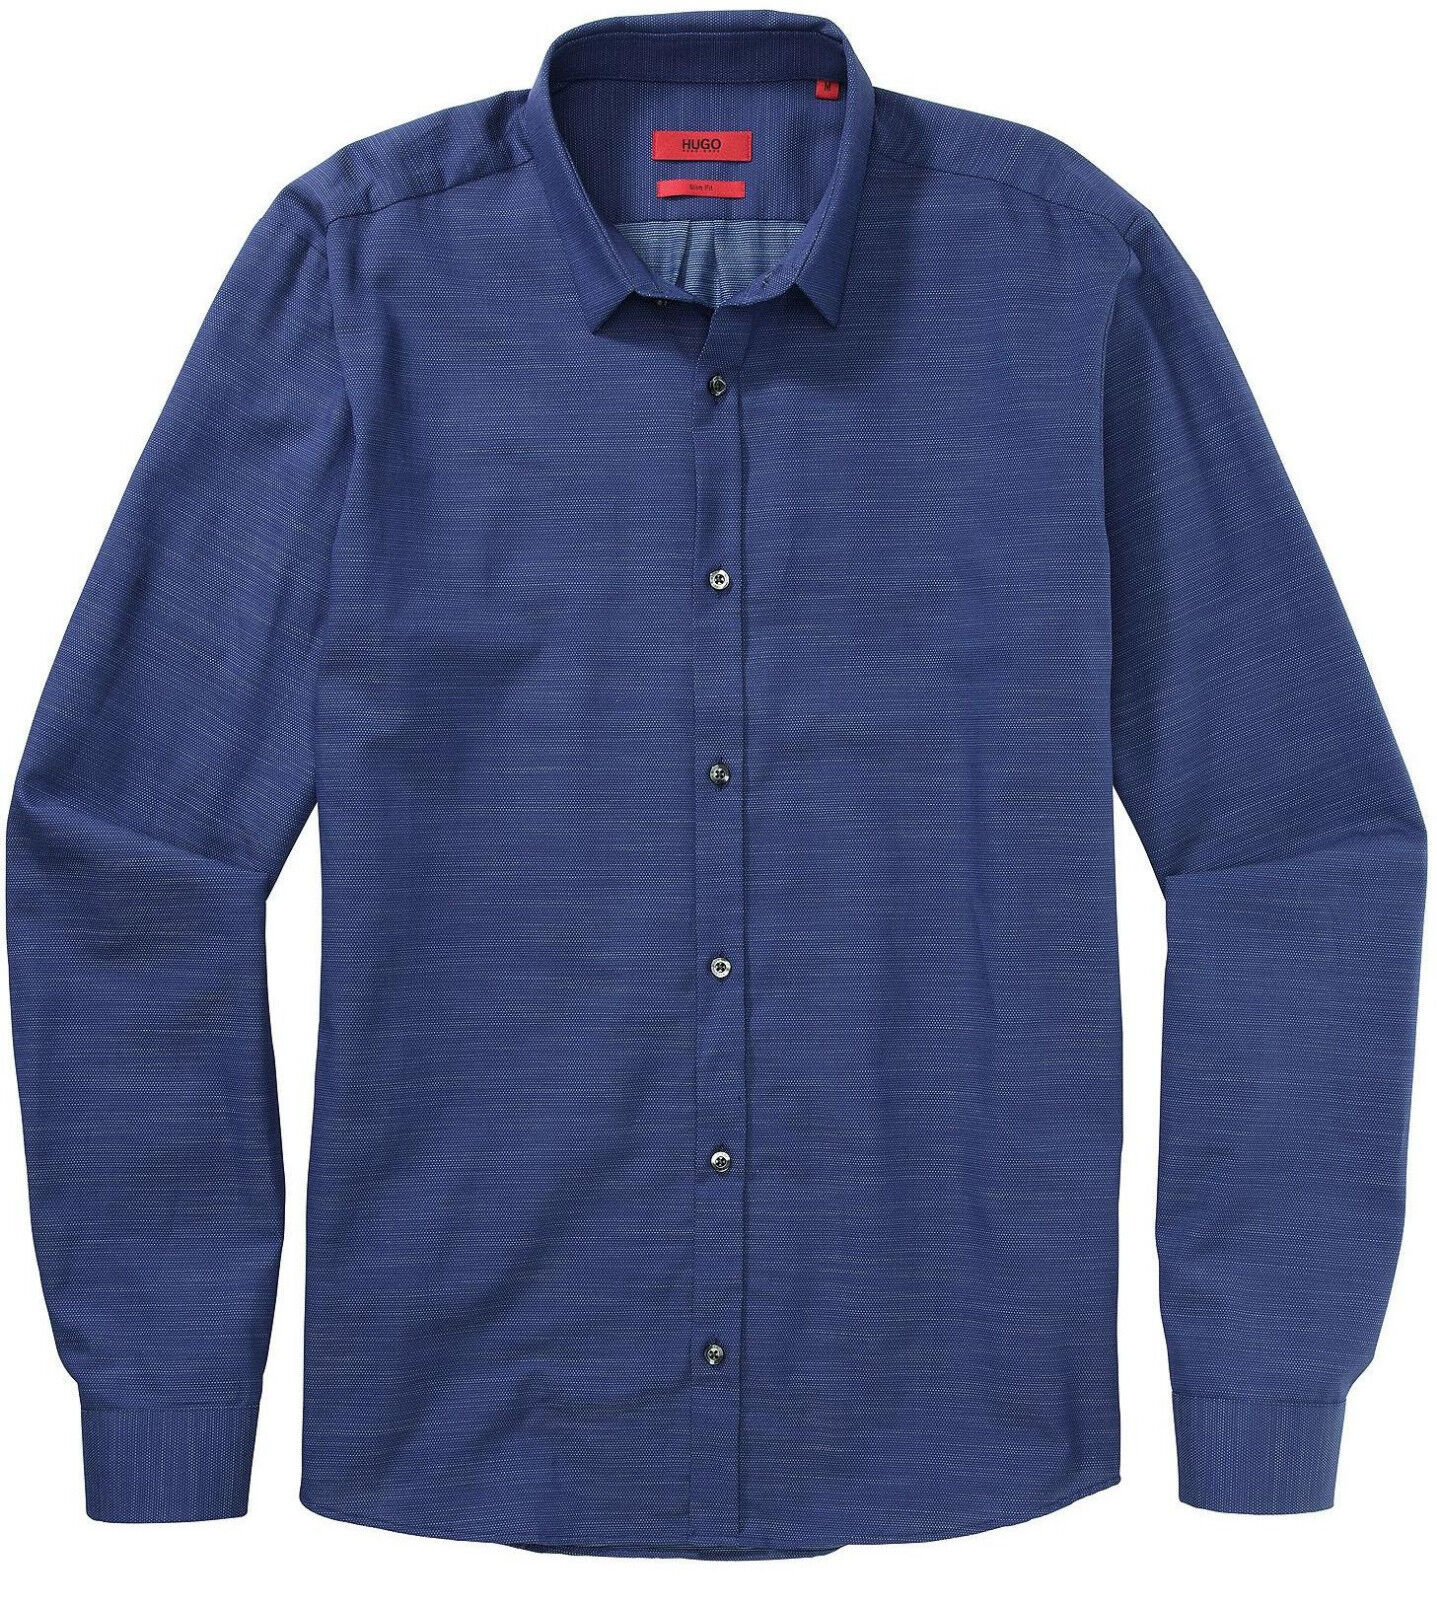 NWT HUGO (Red Label By Hugo Boss) Slim Fit Pin Dot Pattern Sport Shirt  Size M